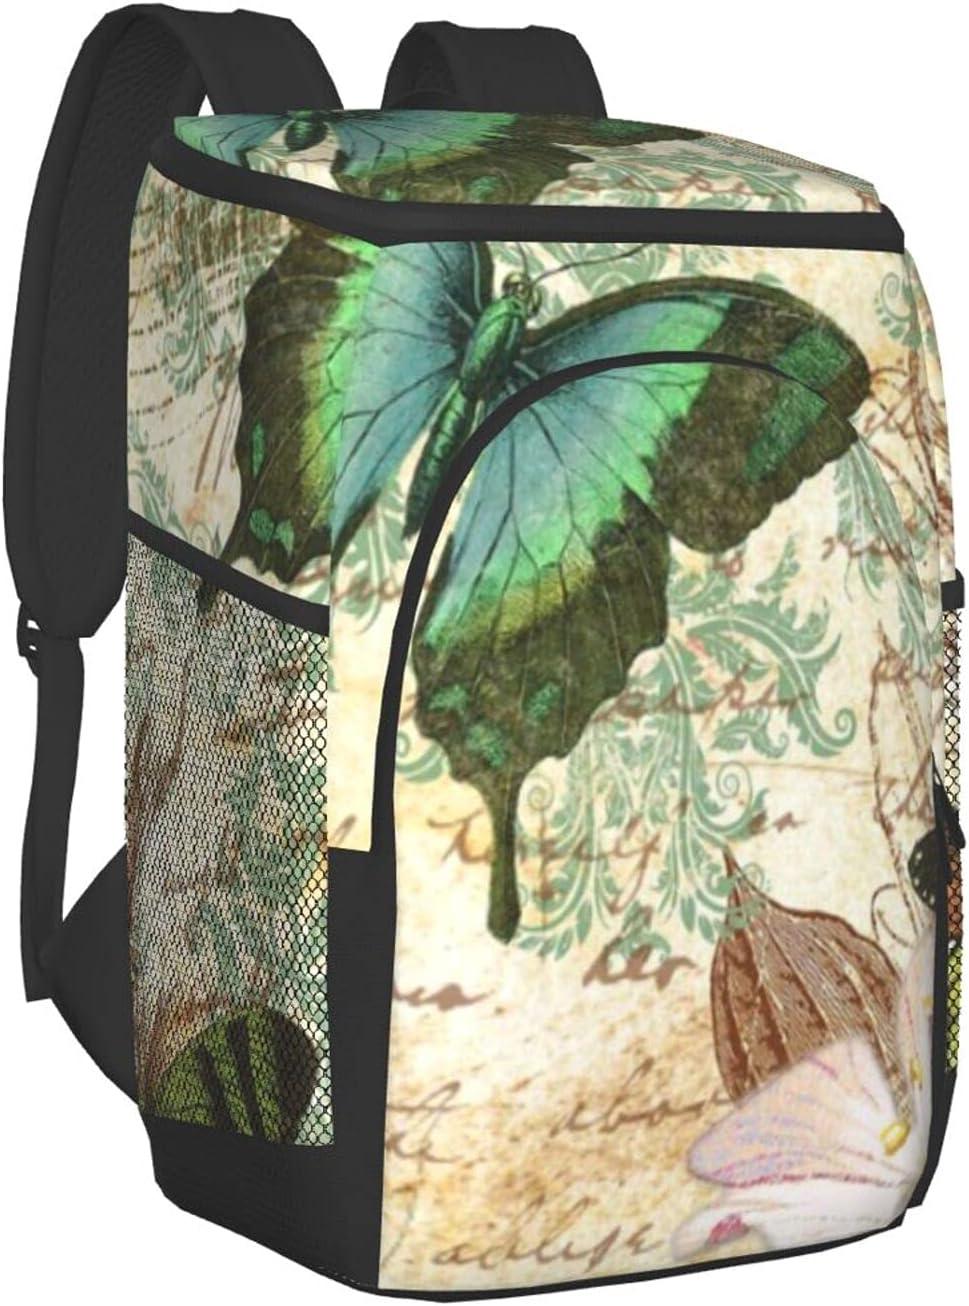 Vintage High order Bargain Butterfly Kisses Insulated Backpack Cooler Leakproof Sof